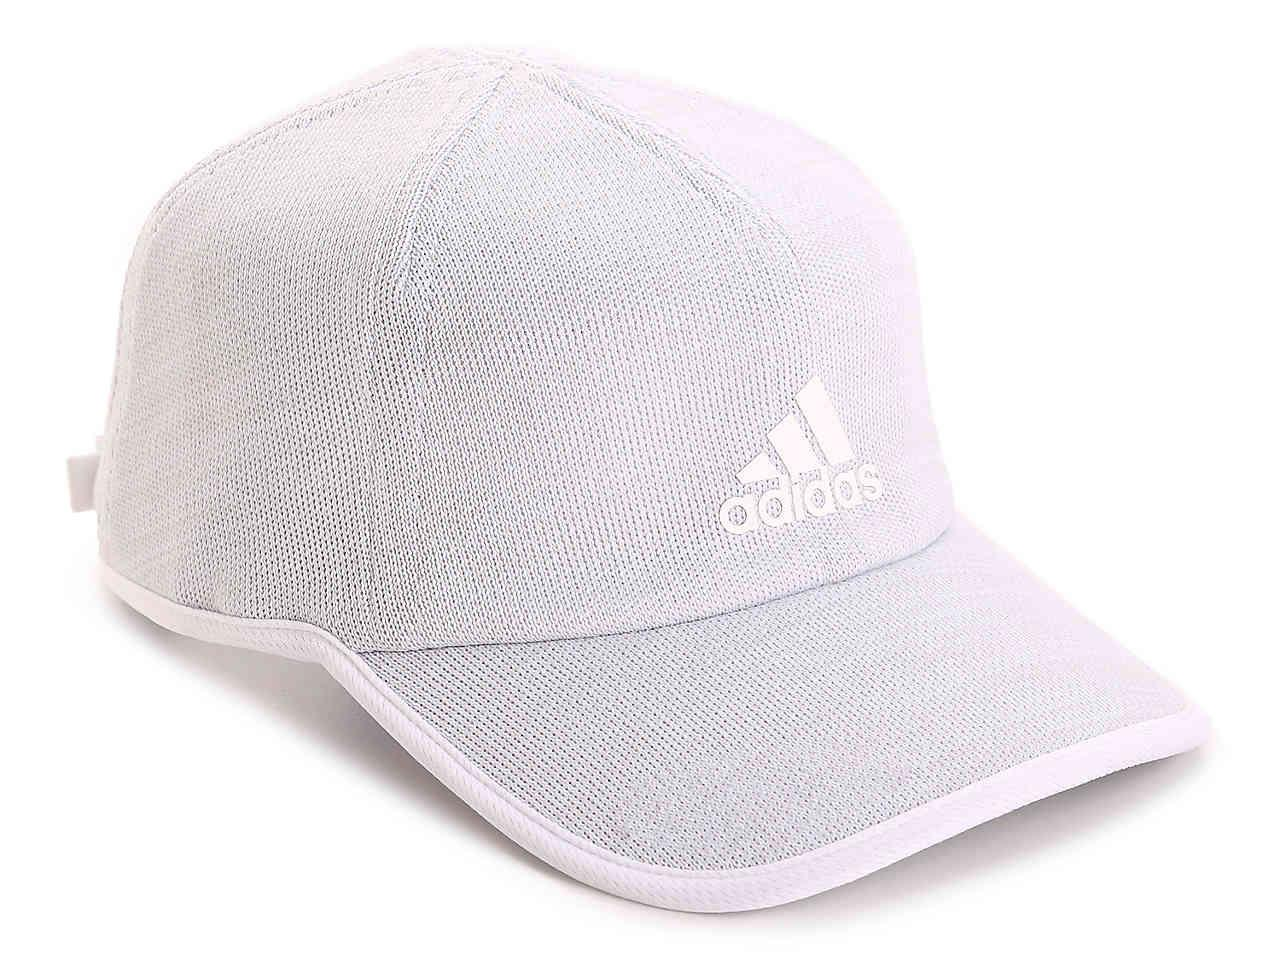 54fd45d612a Adidas - Gray Superlite Prime Ii Baseball Cap for Men - Lyst. View  fullscreen